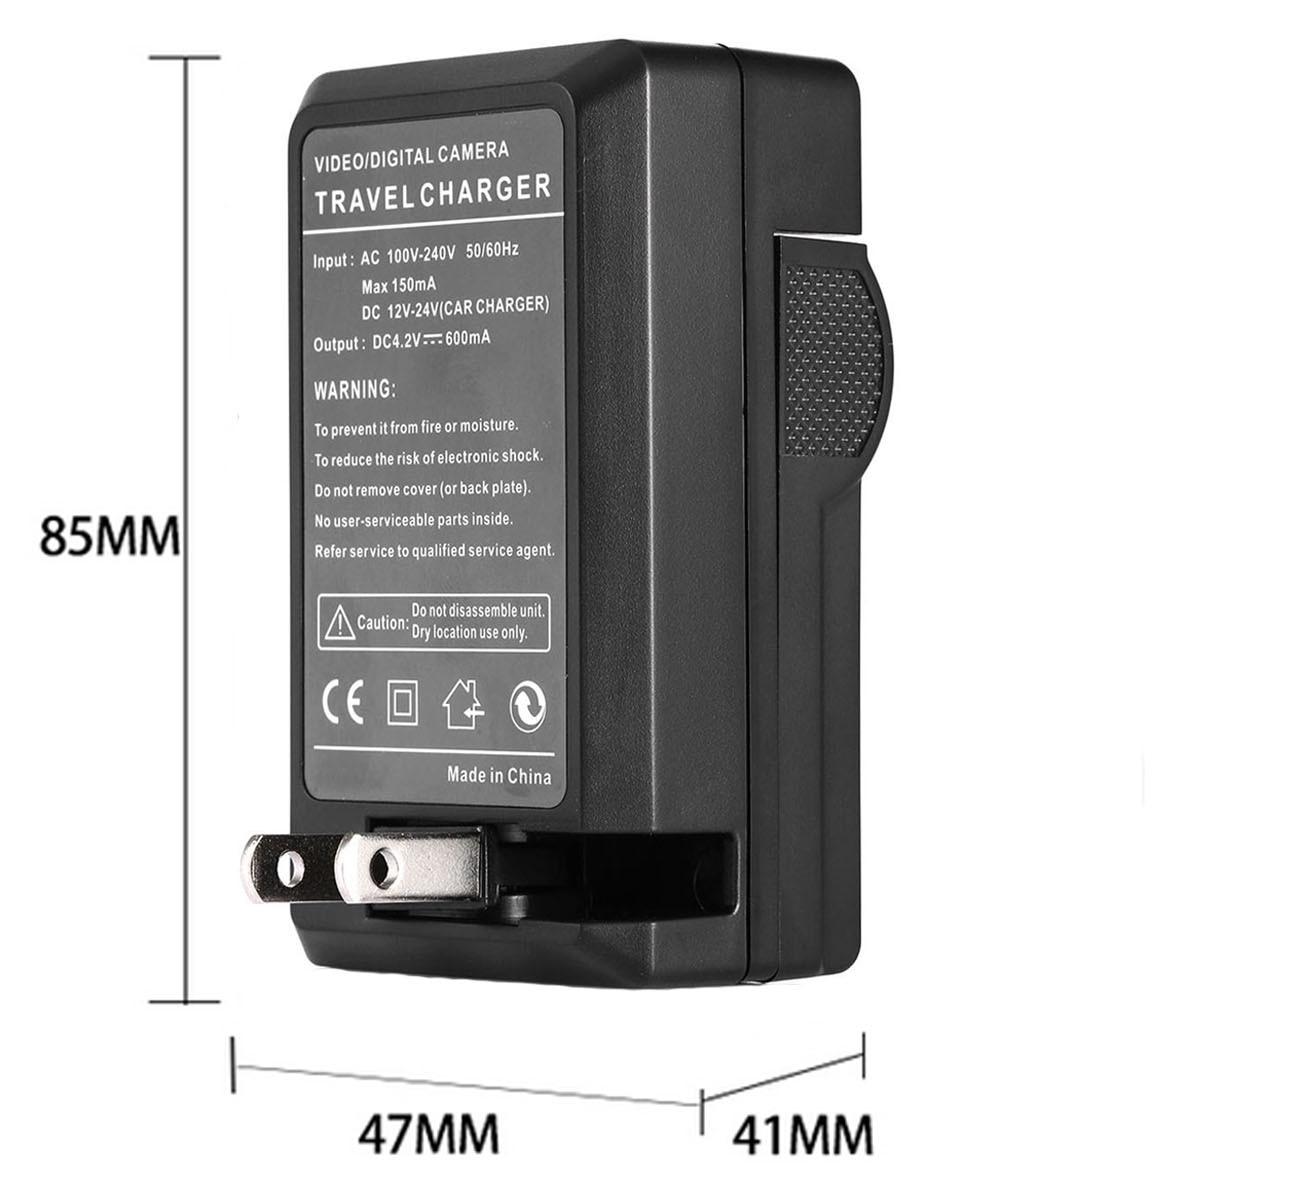 Panasonic LUMIX dmc-fz60 Lumix dc-fz82 cargador Cargador de de-a84a